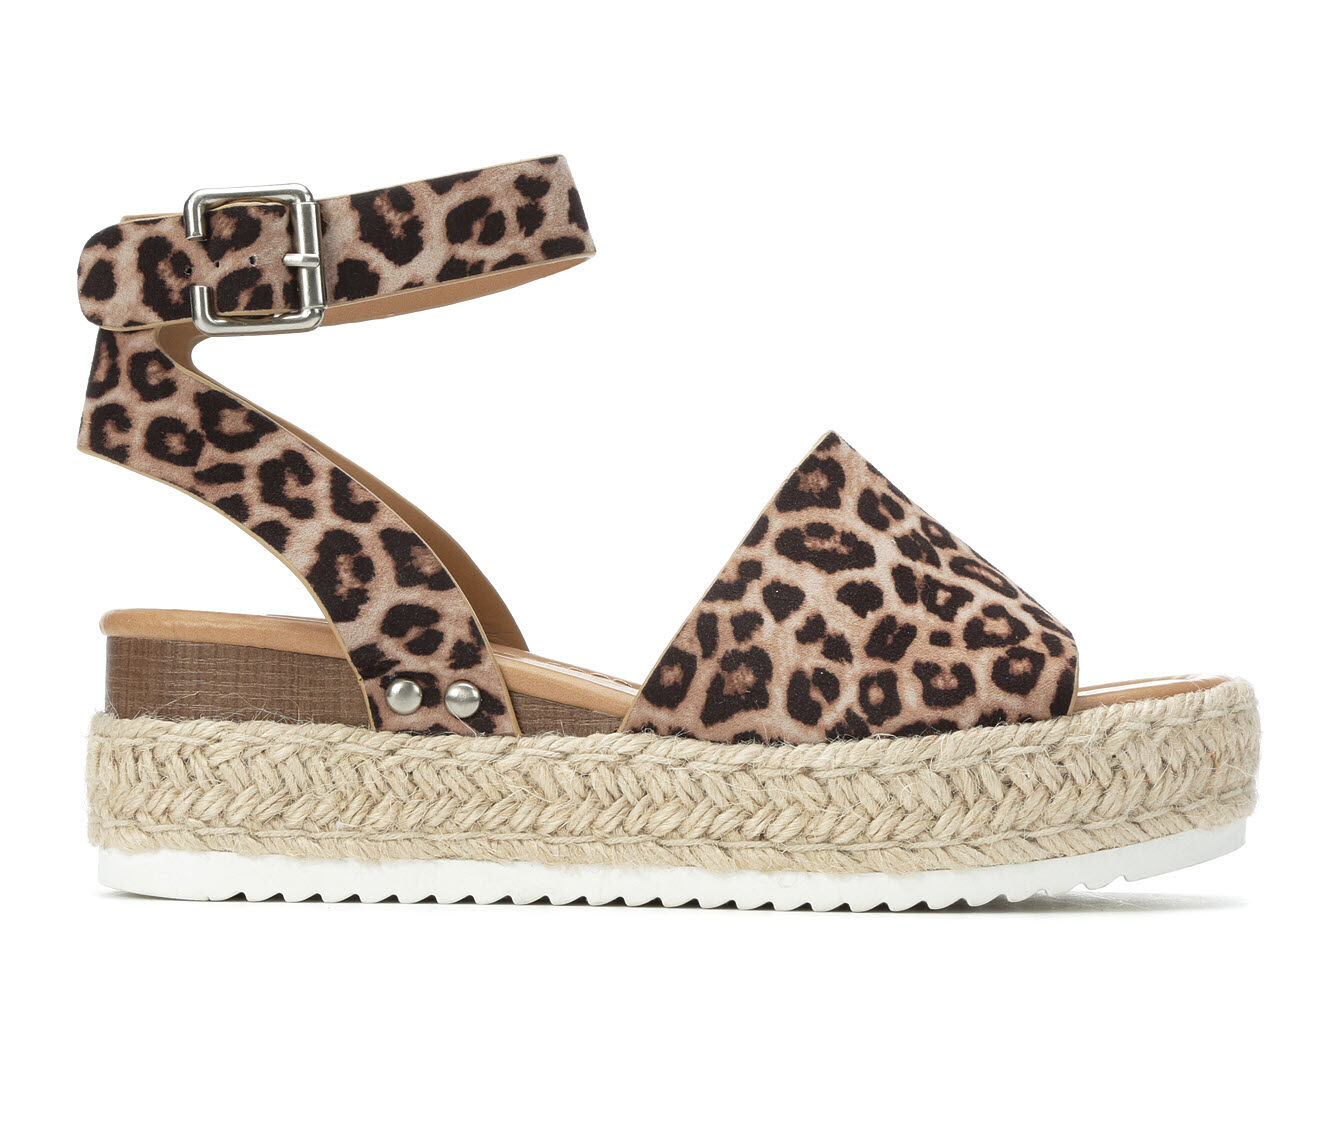 purchase cheap Women's Soda Topic Flatform Sandals Oatmeal Cheetah